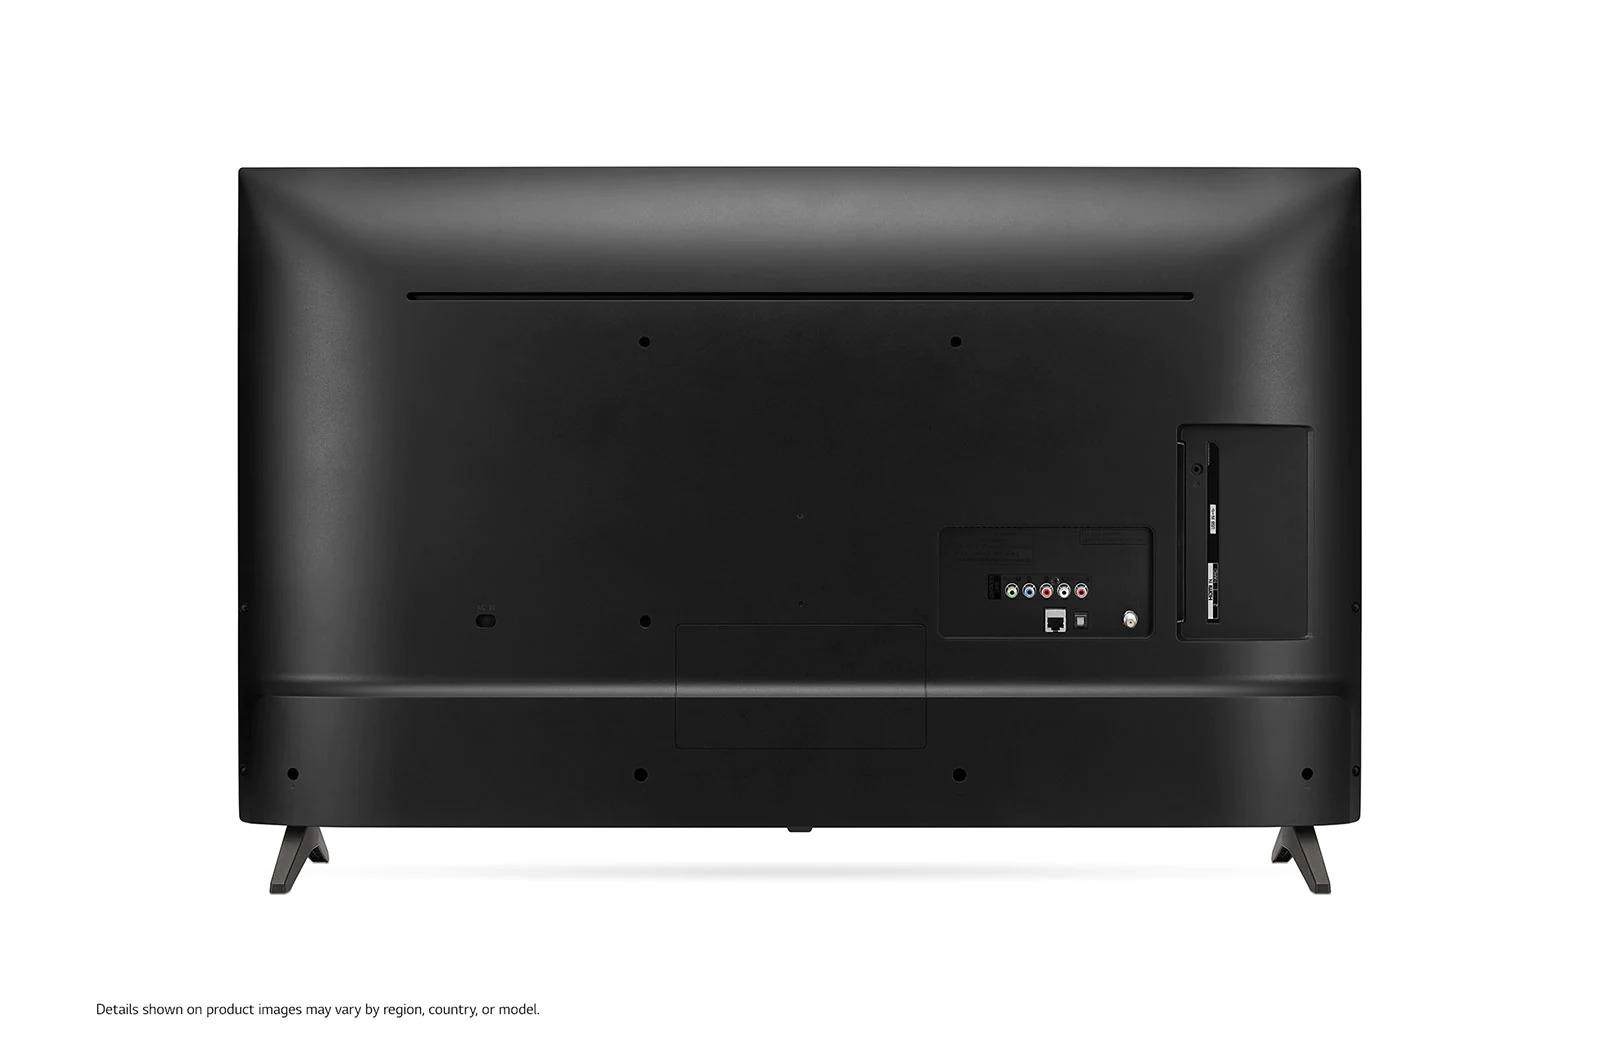 LG (32LM565BPTA) 81.28 Cm HD SMART TV